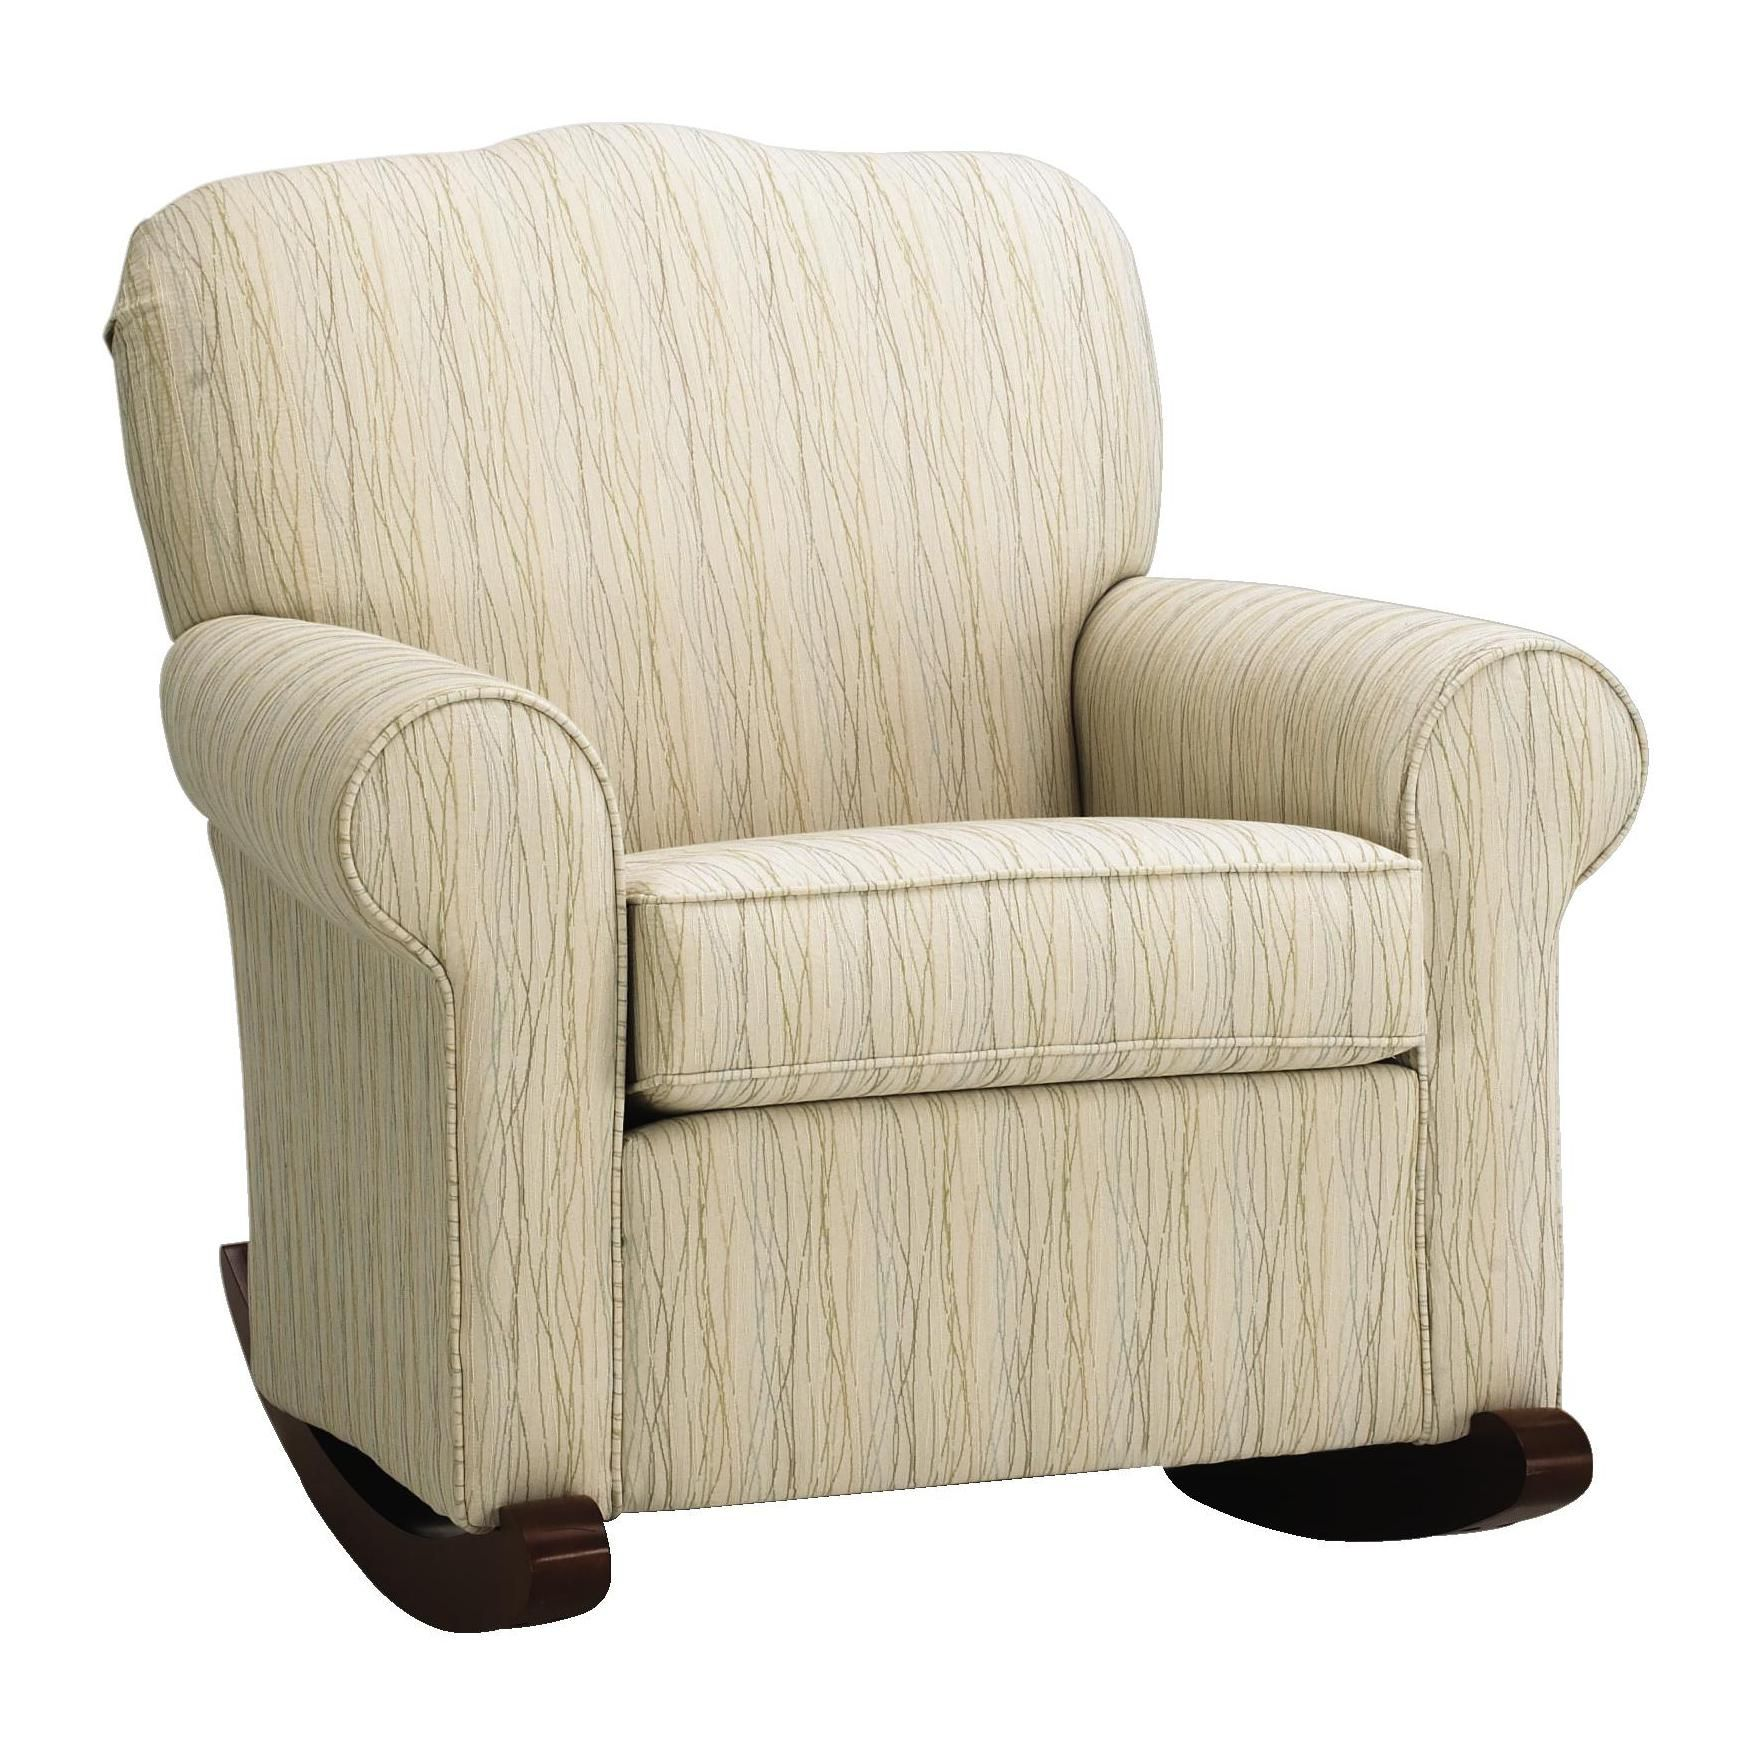 Elegant Furniture · Upholstered Rocking Chair Ideas